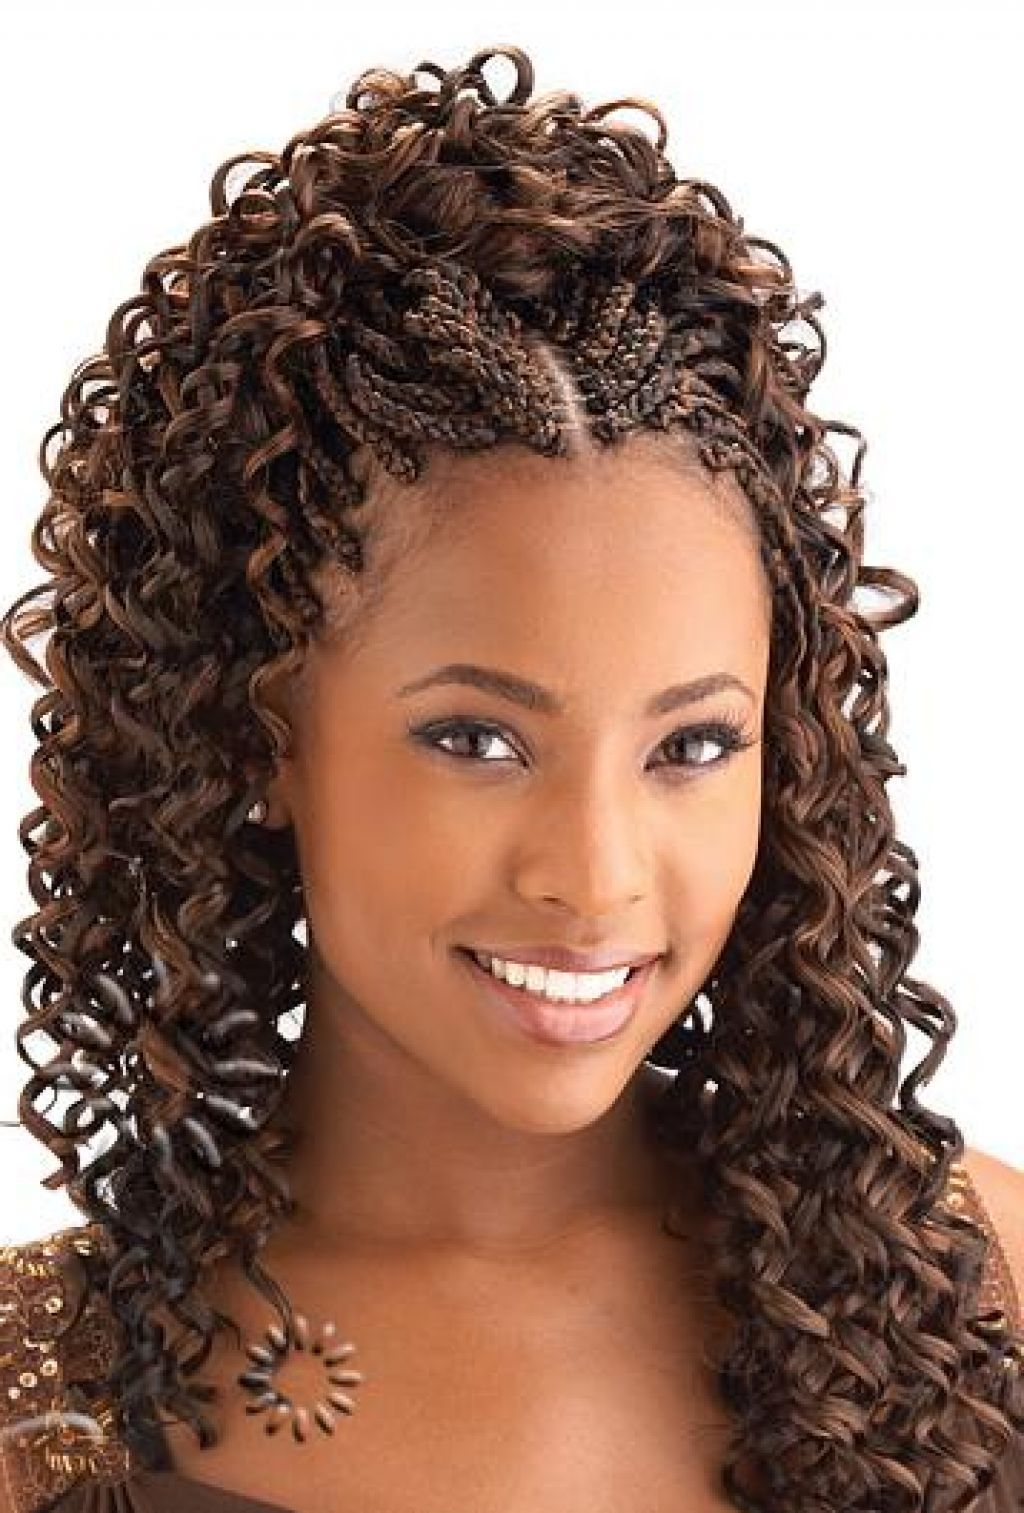 Stupendous Micro Braids Braids And Micro Braids Hairstyles On Pinterest Hairstyles For Women Draintrainus